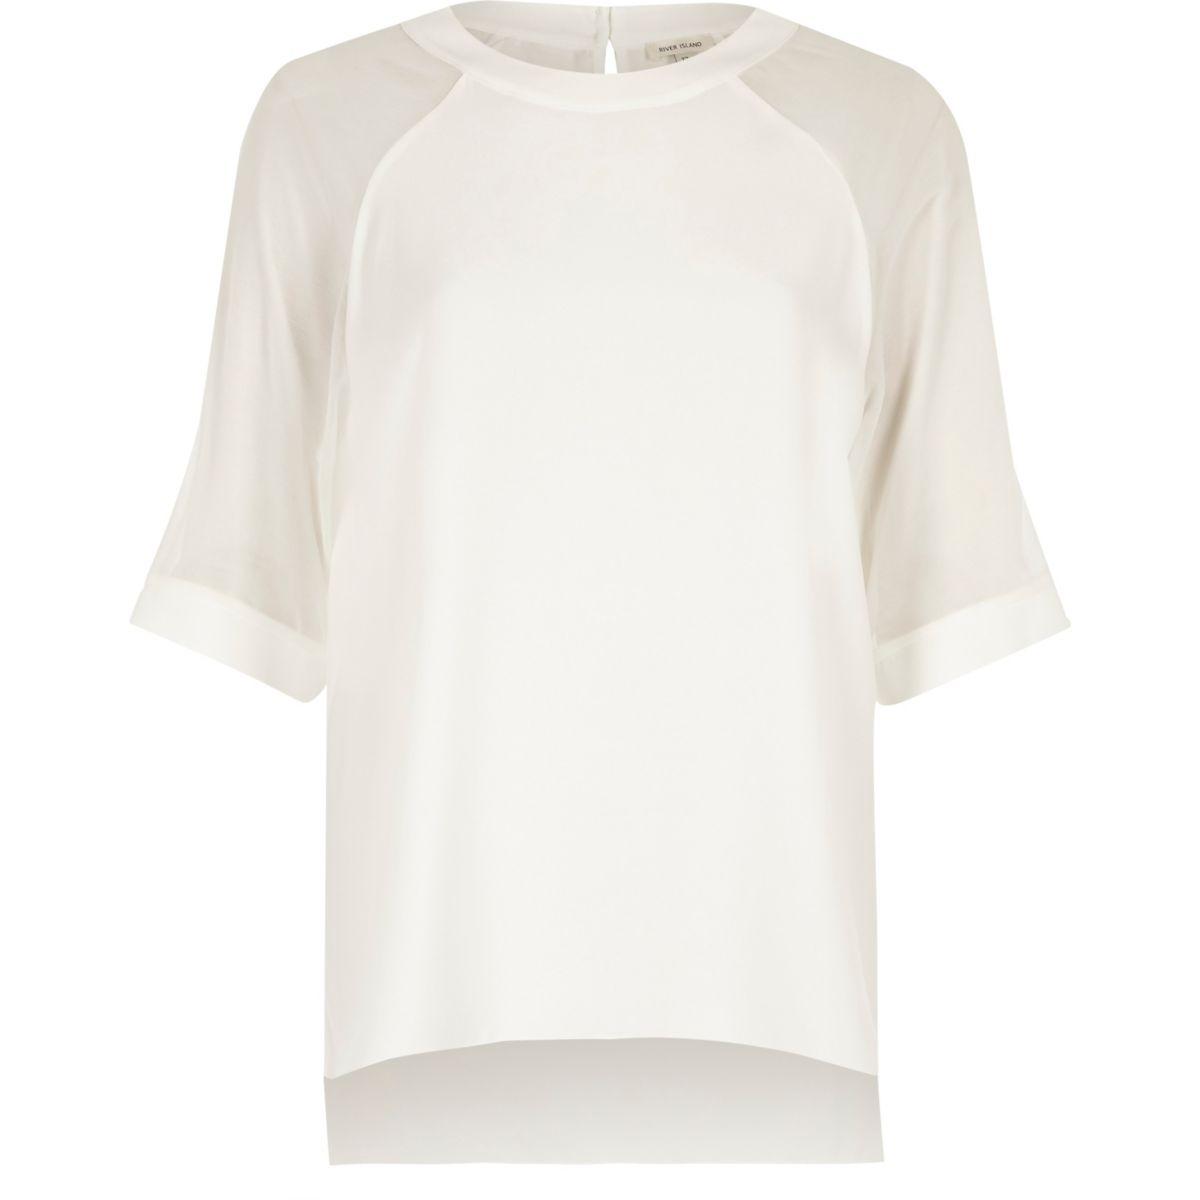 White chiffon sleeve top